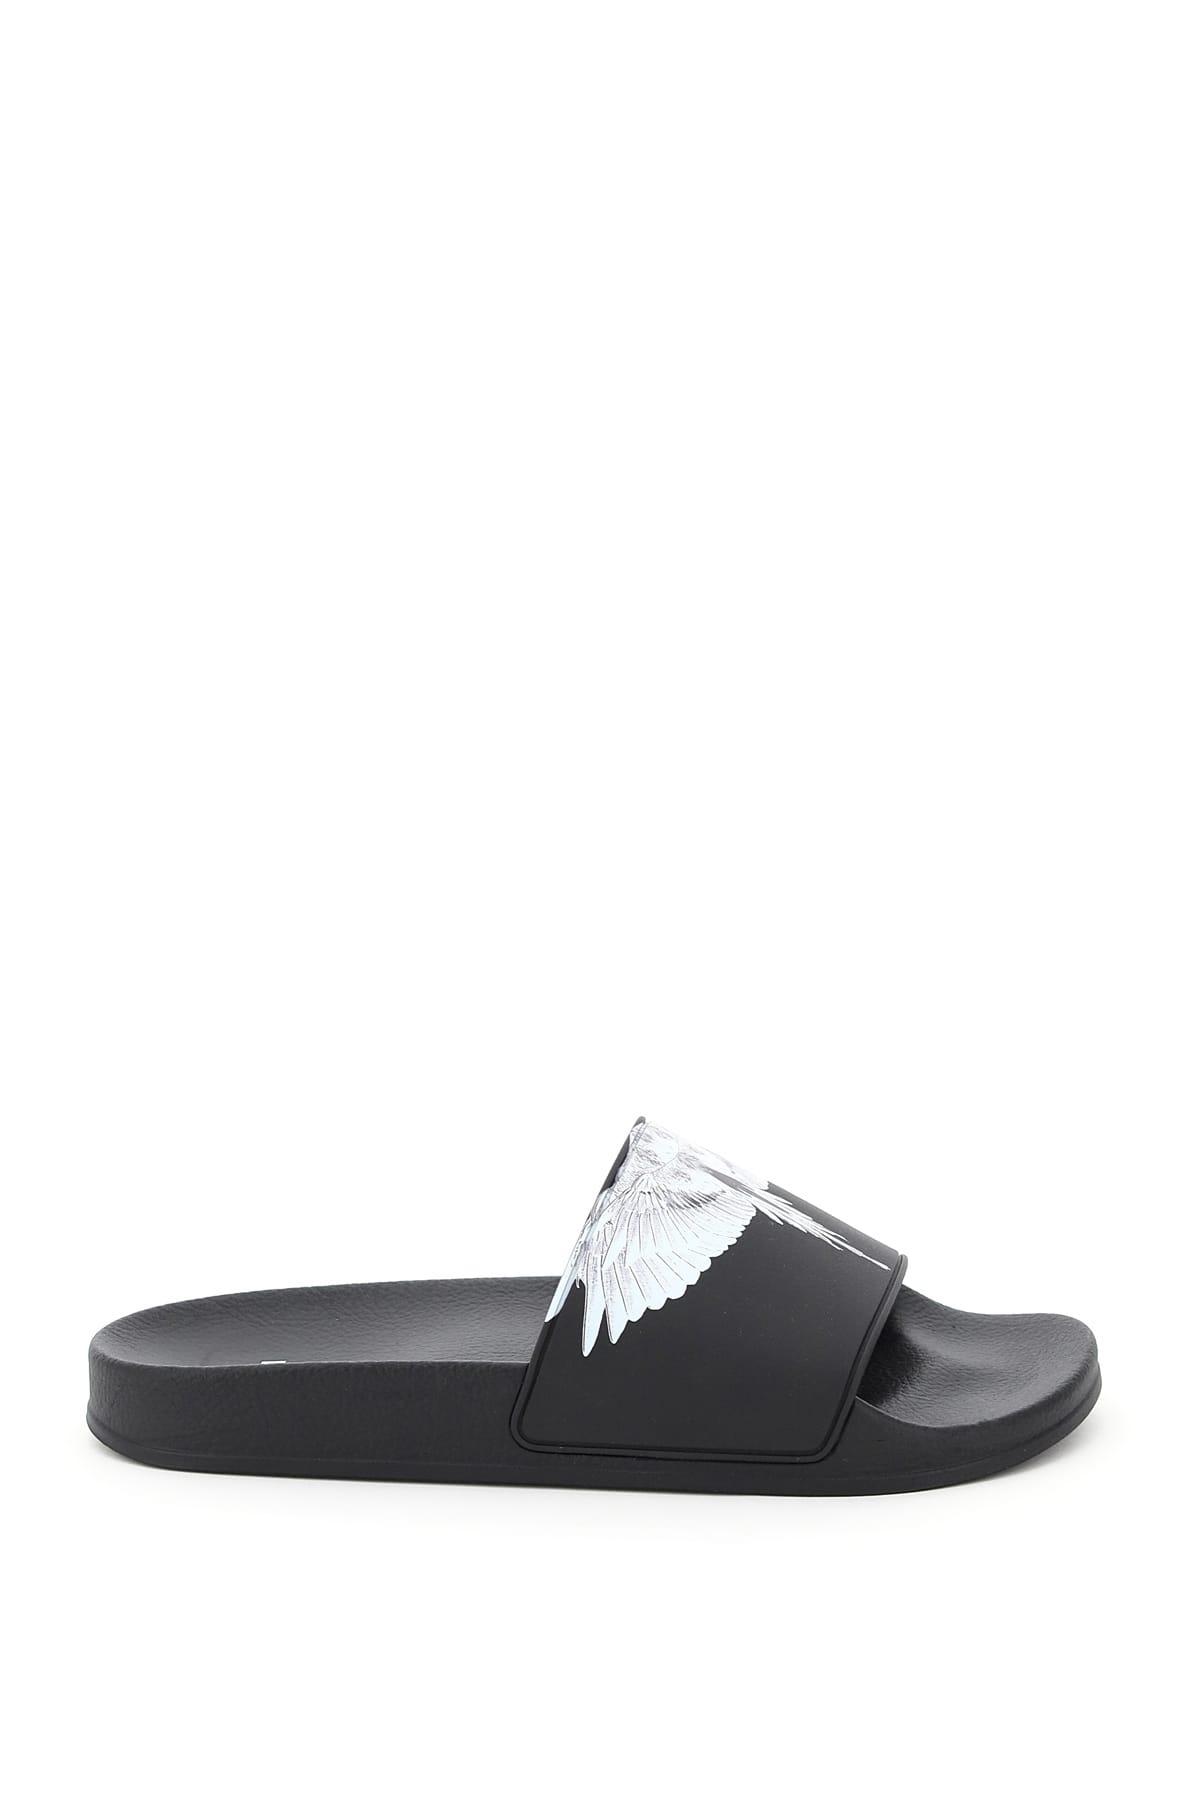 Marcelo Burlon County Of Milan Shoes WINGS PRINT RUBBER SLIDES